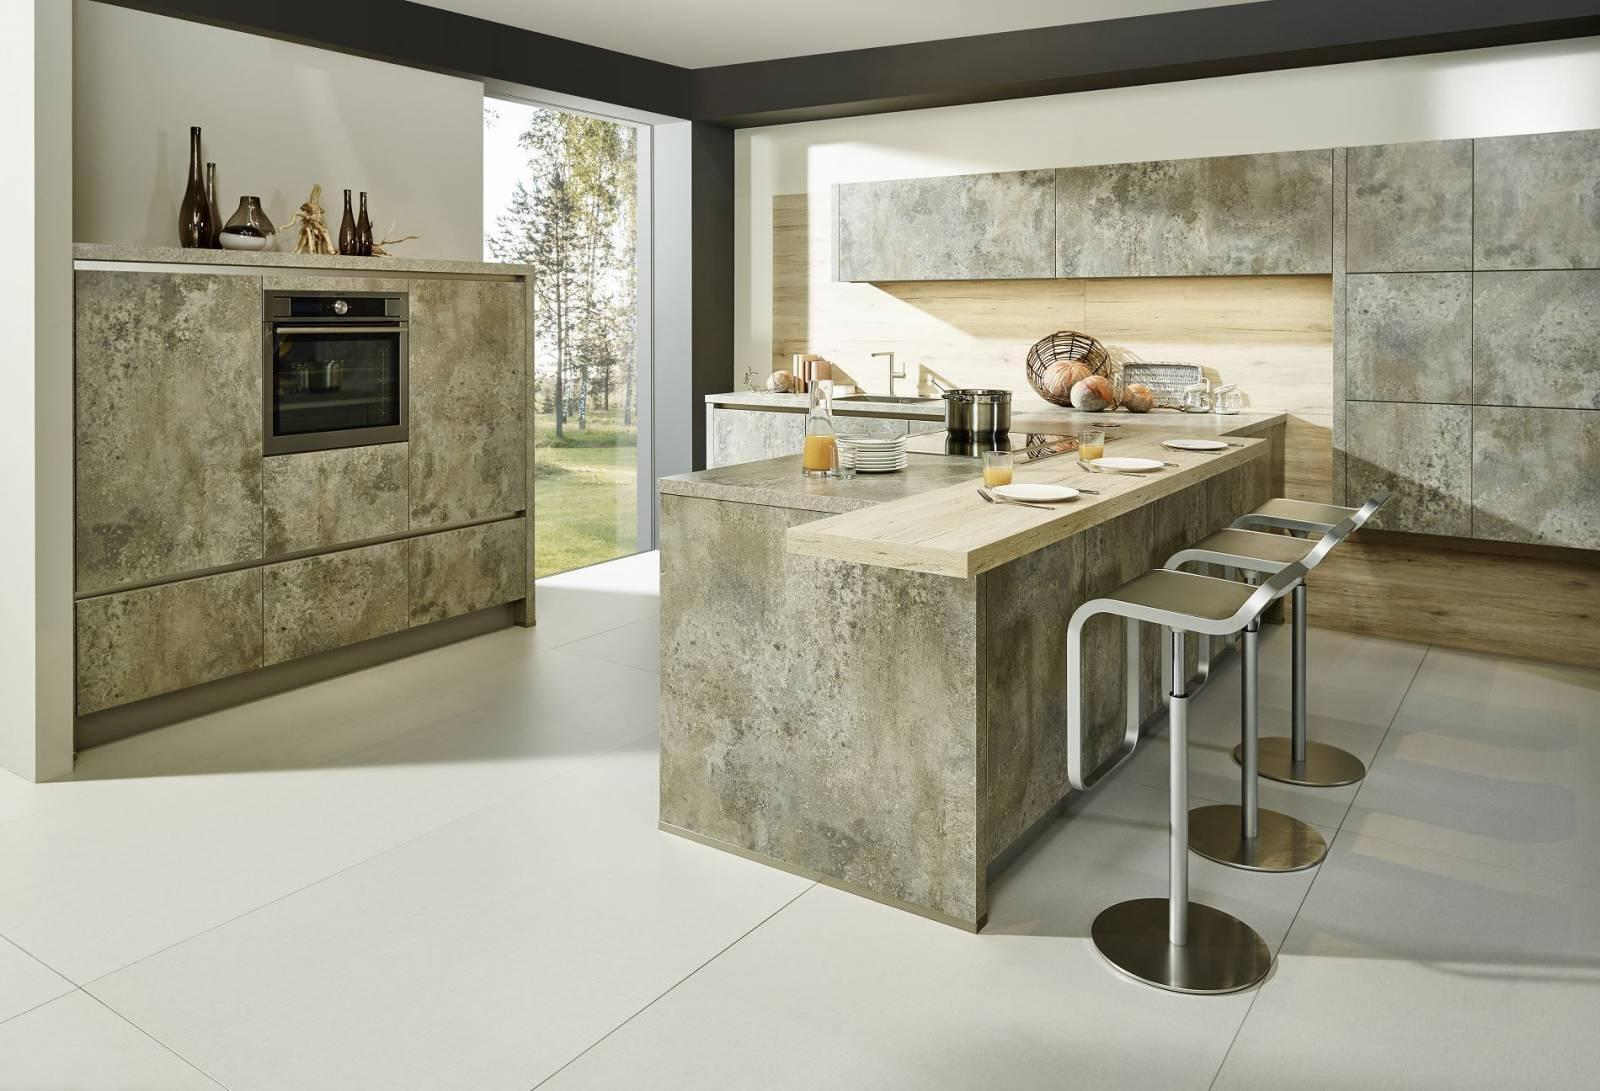 Acheter une cuisine quip e libourne conception de for Acheter cuisine equipee